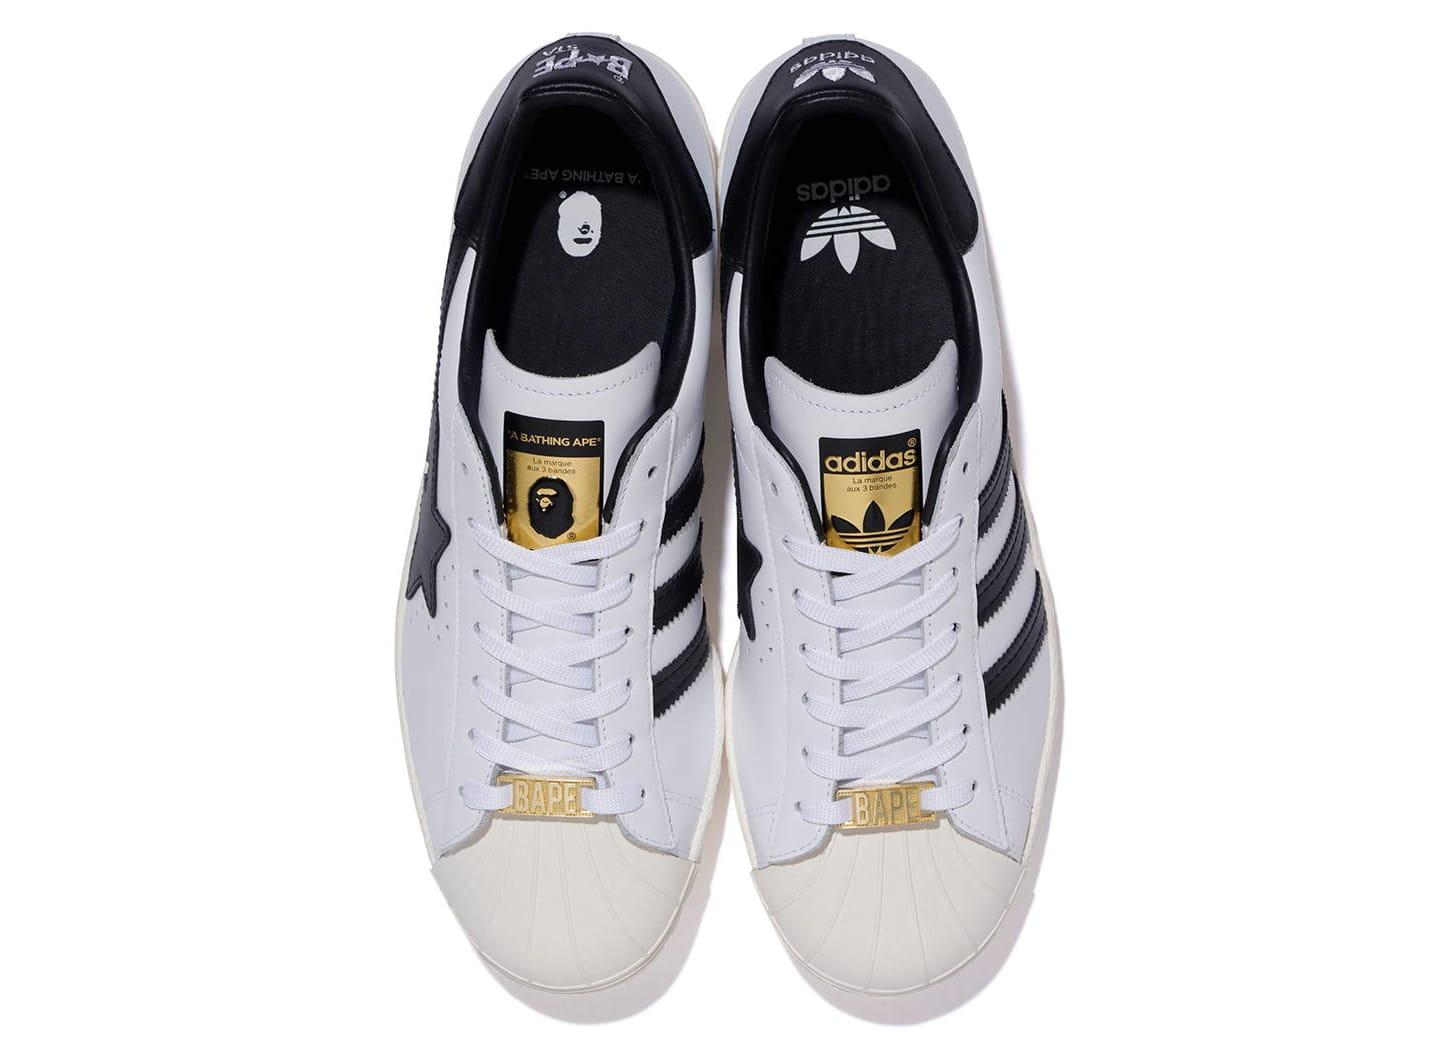 Bape x Adidas Originals Superstar Top